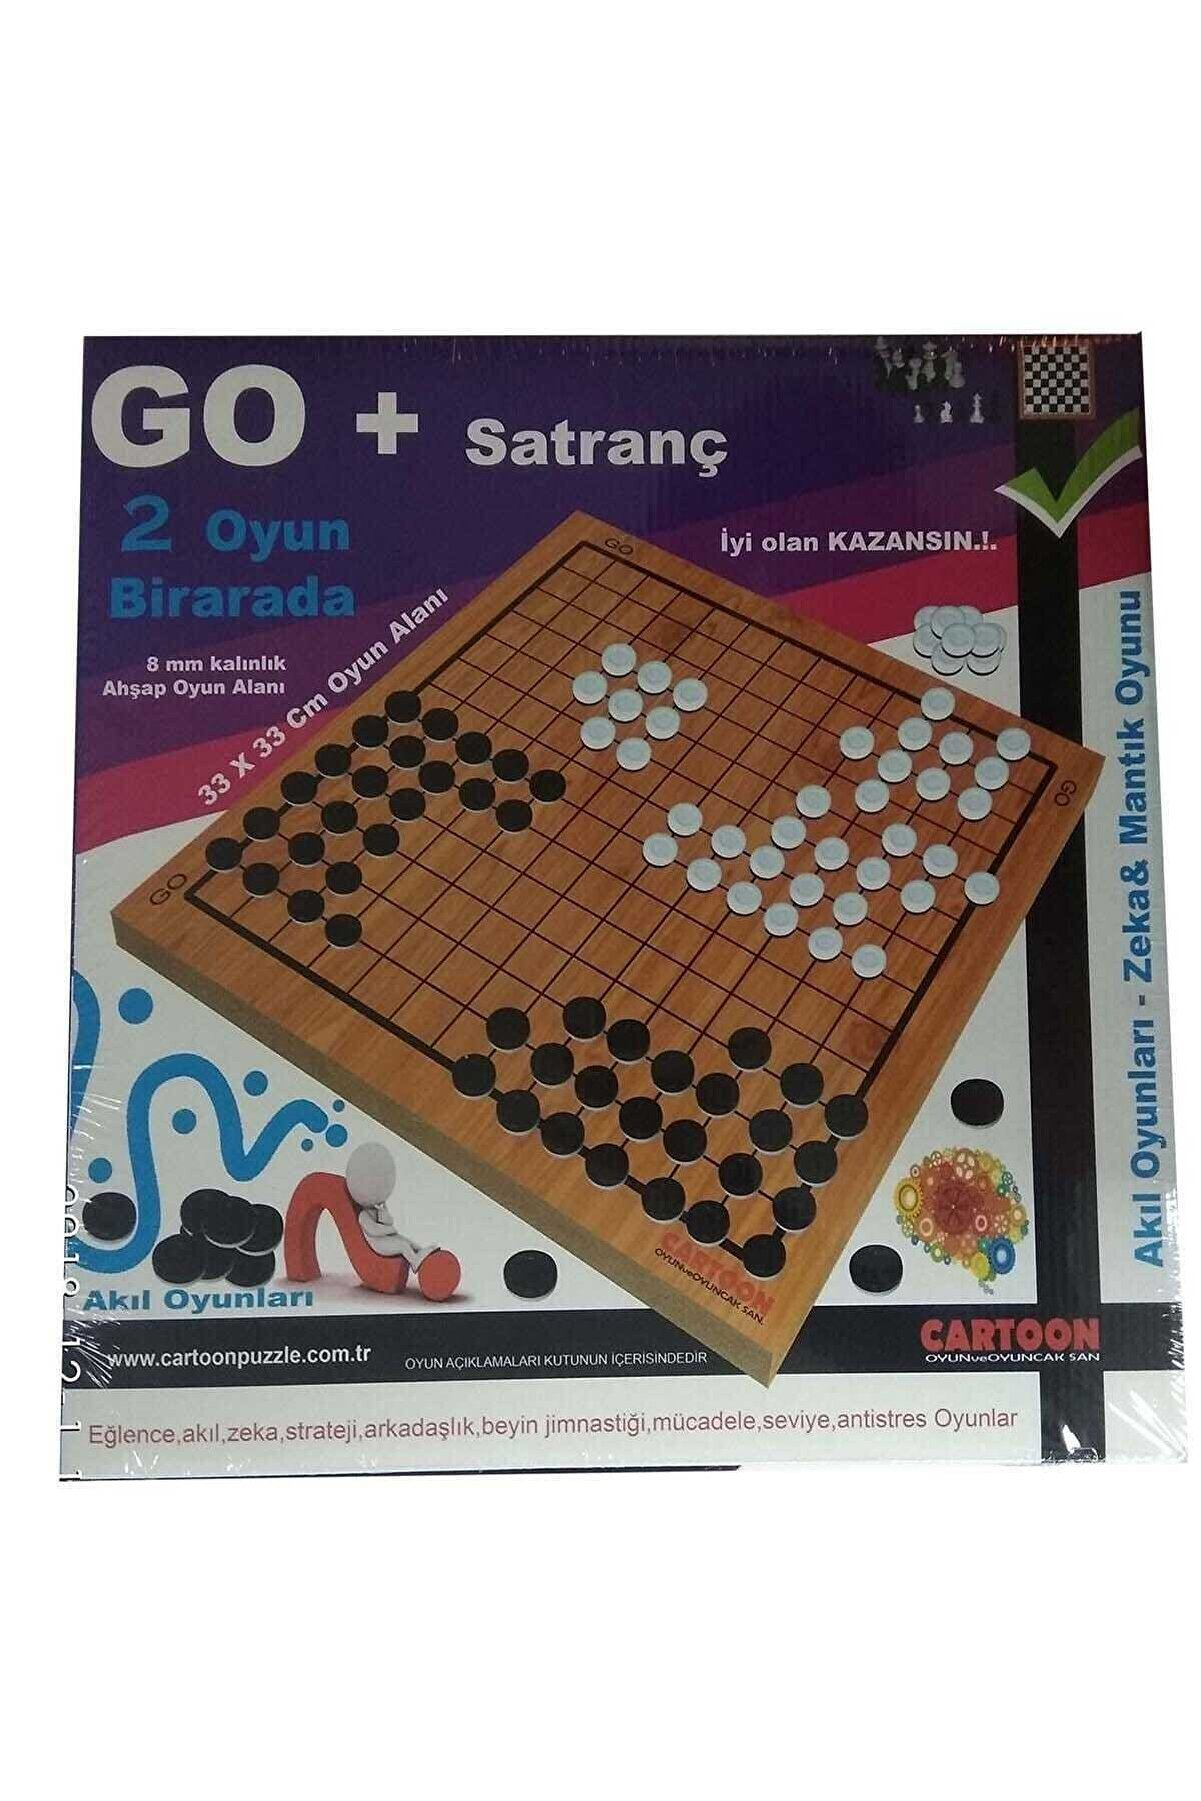 CARTOON Oyuncak Aile Oyunu Go + Satranç /